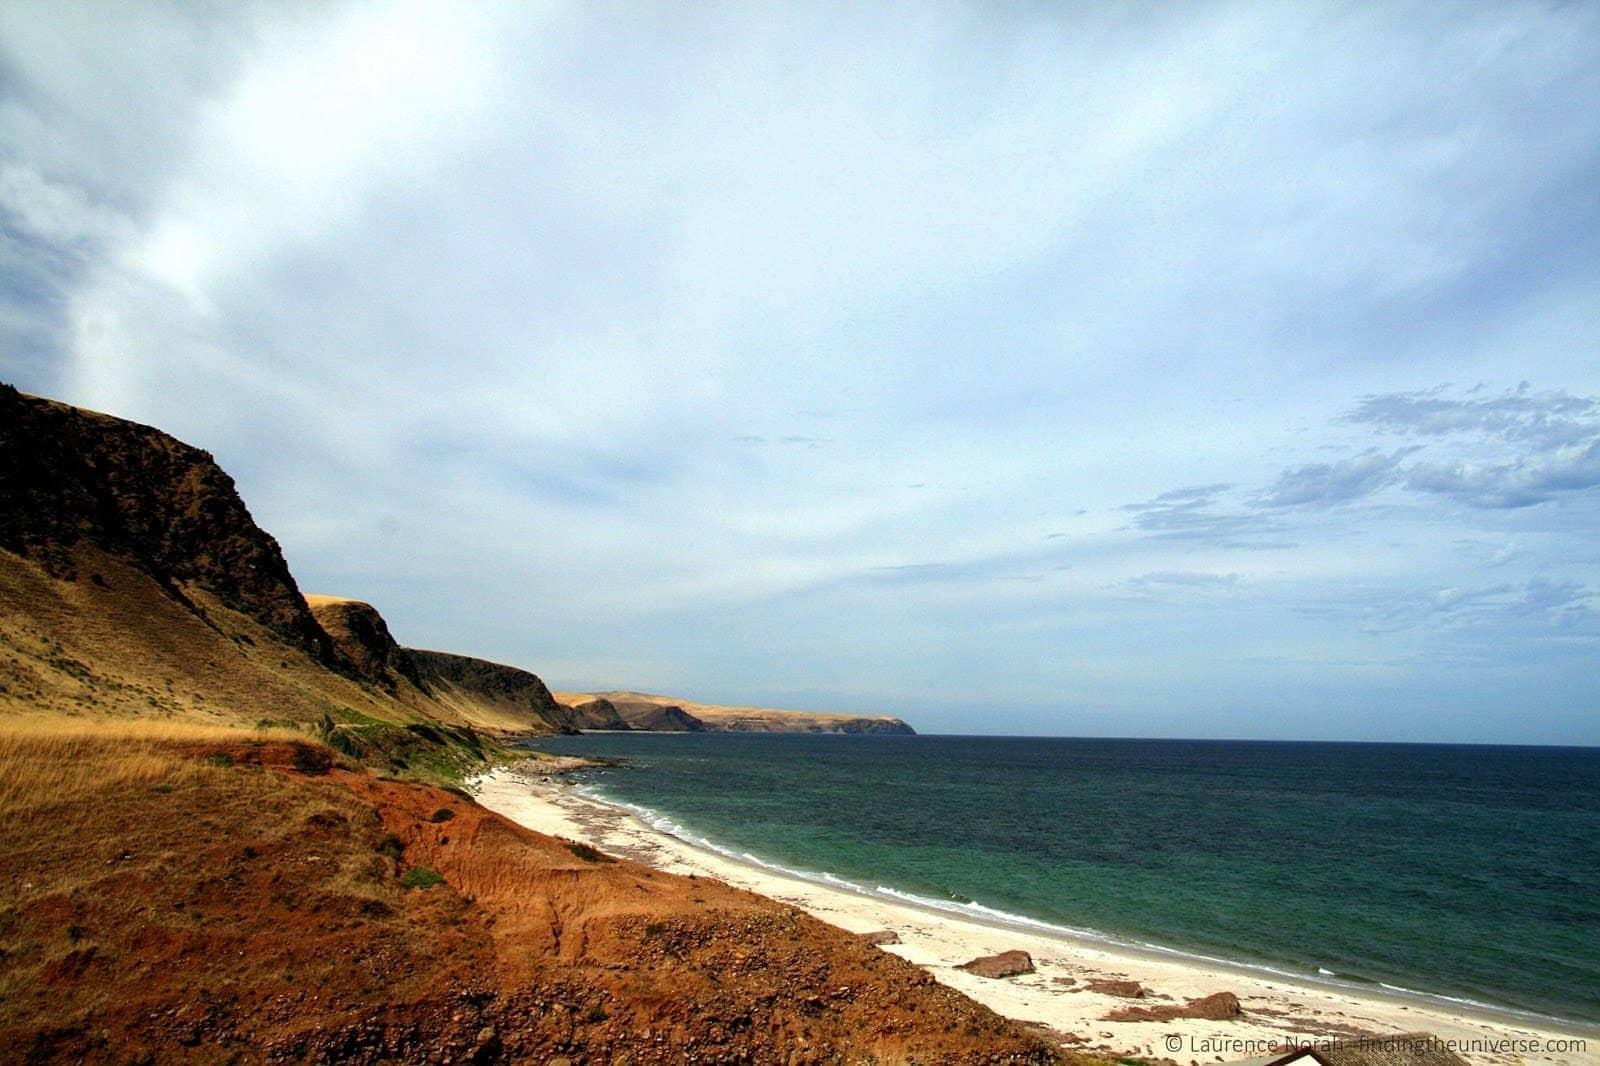 Australia beach 2.png